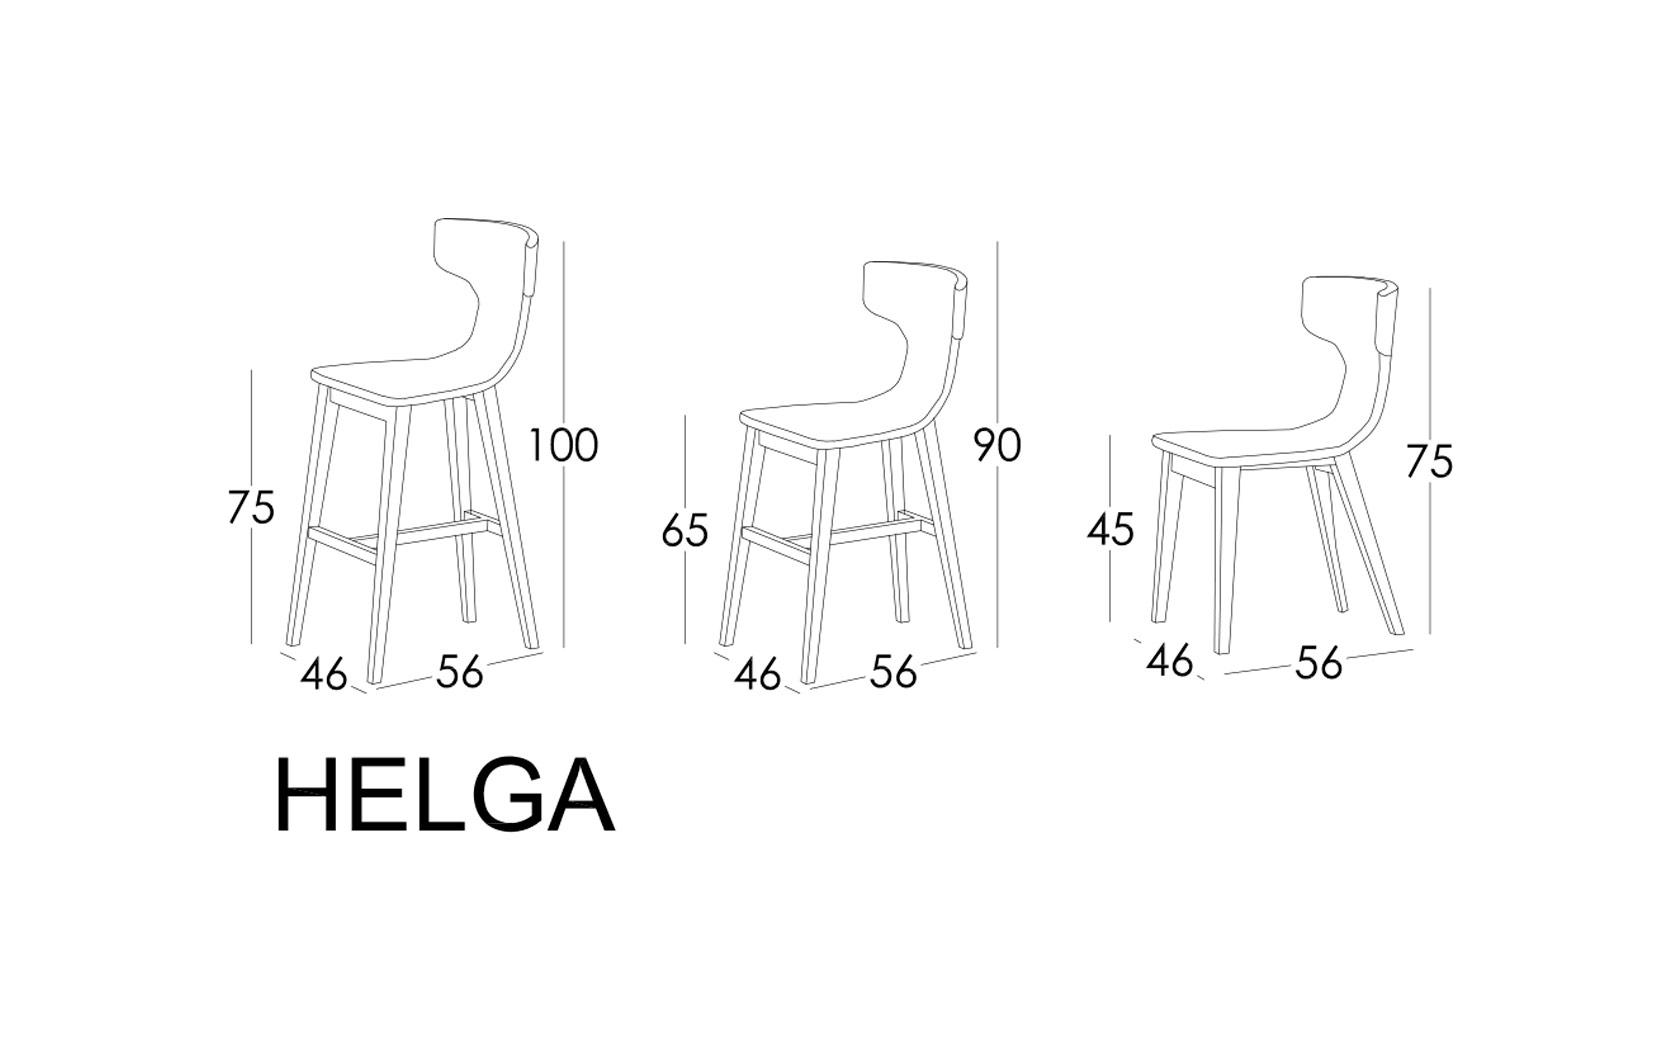 Helga taburete Fama 2020 - Medidas